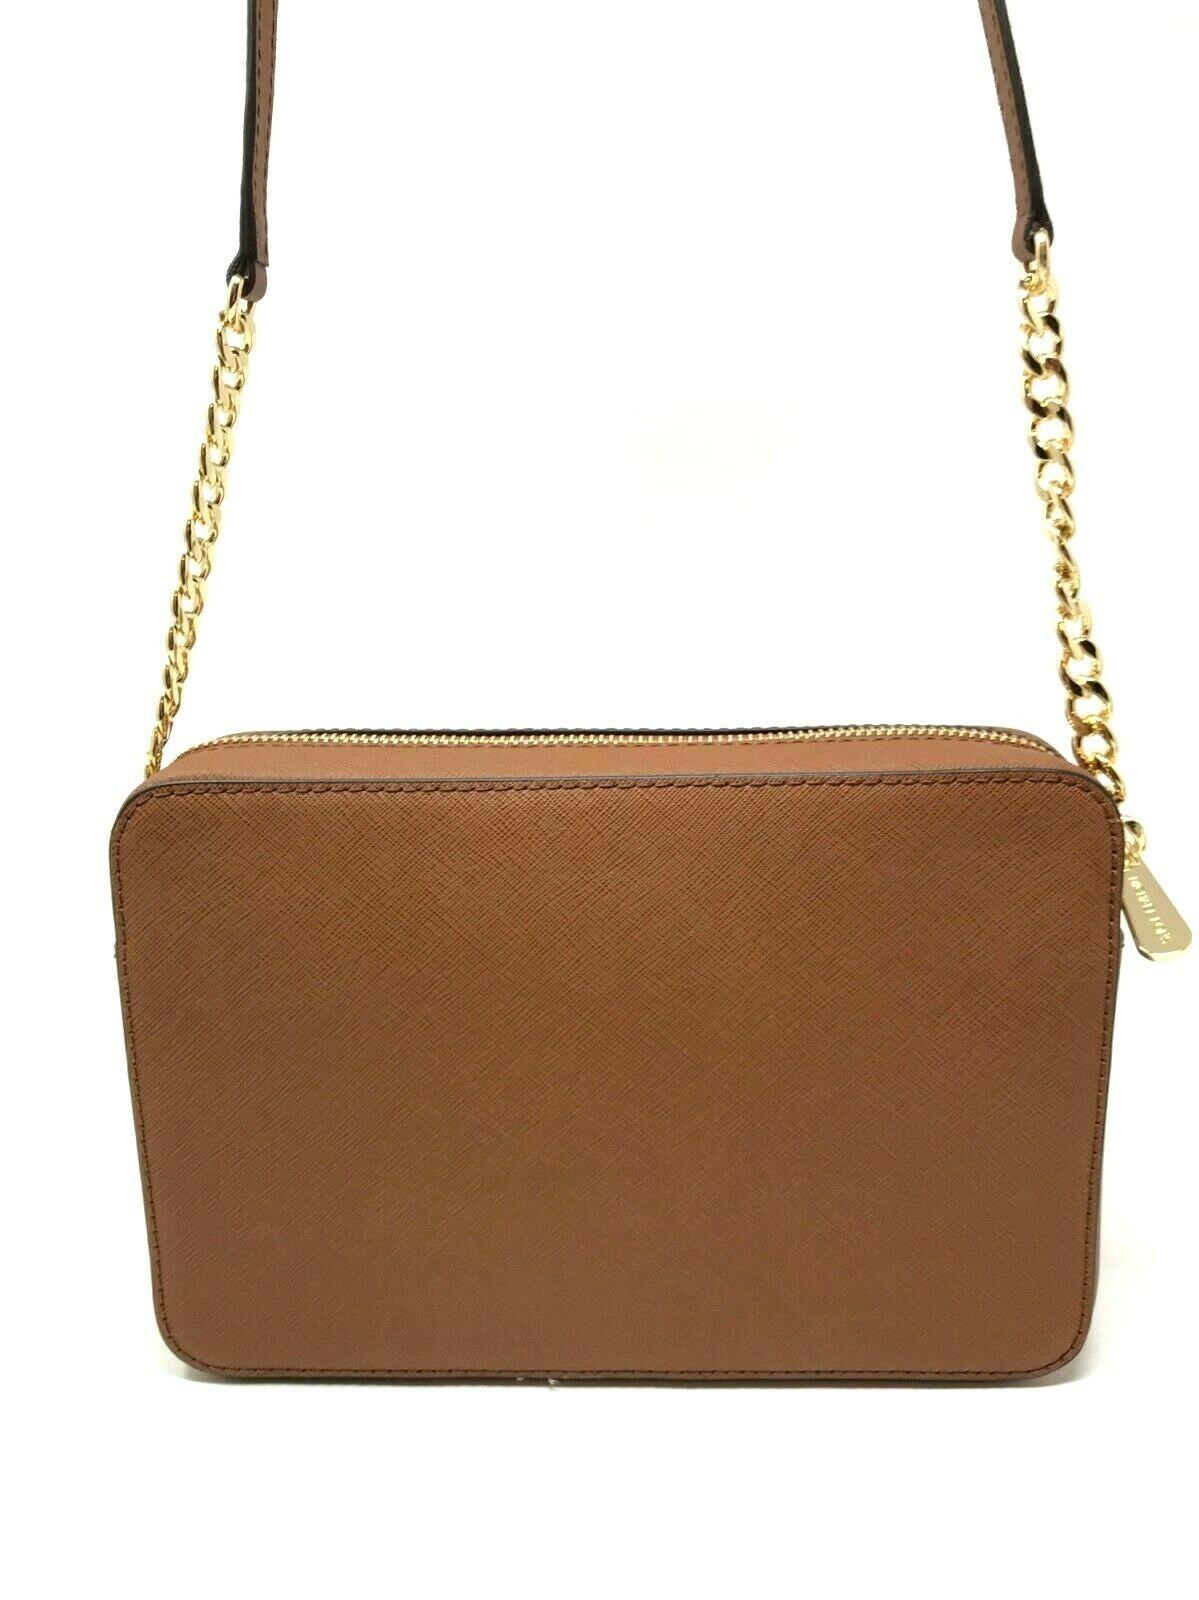 thumbnail 11 - Michael Kors Jet Set Item Large East West Crossbody Chain Handbag Clutch $298